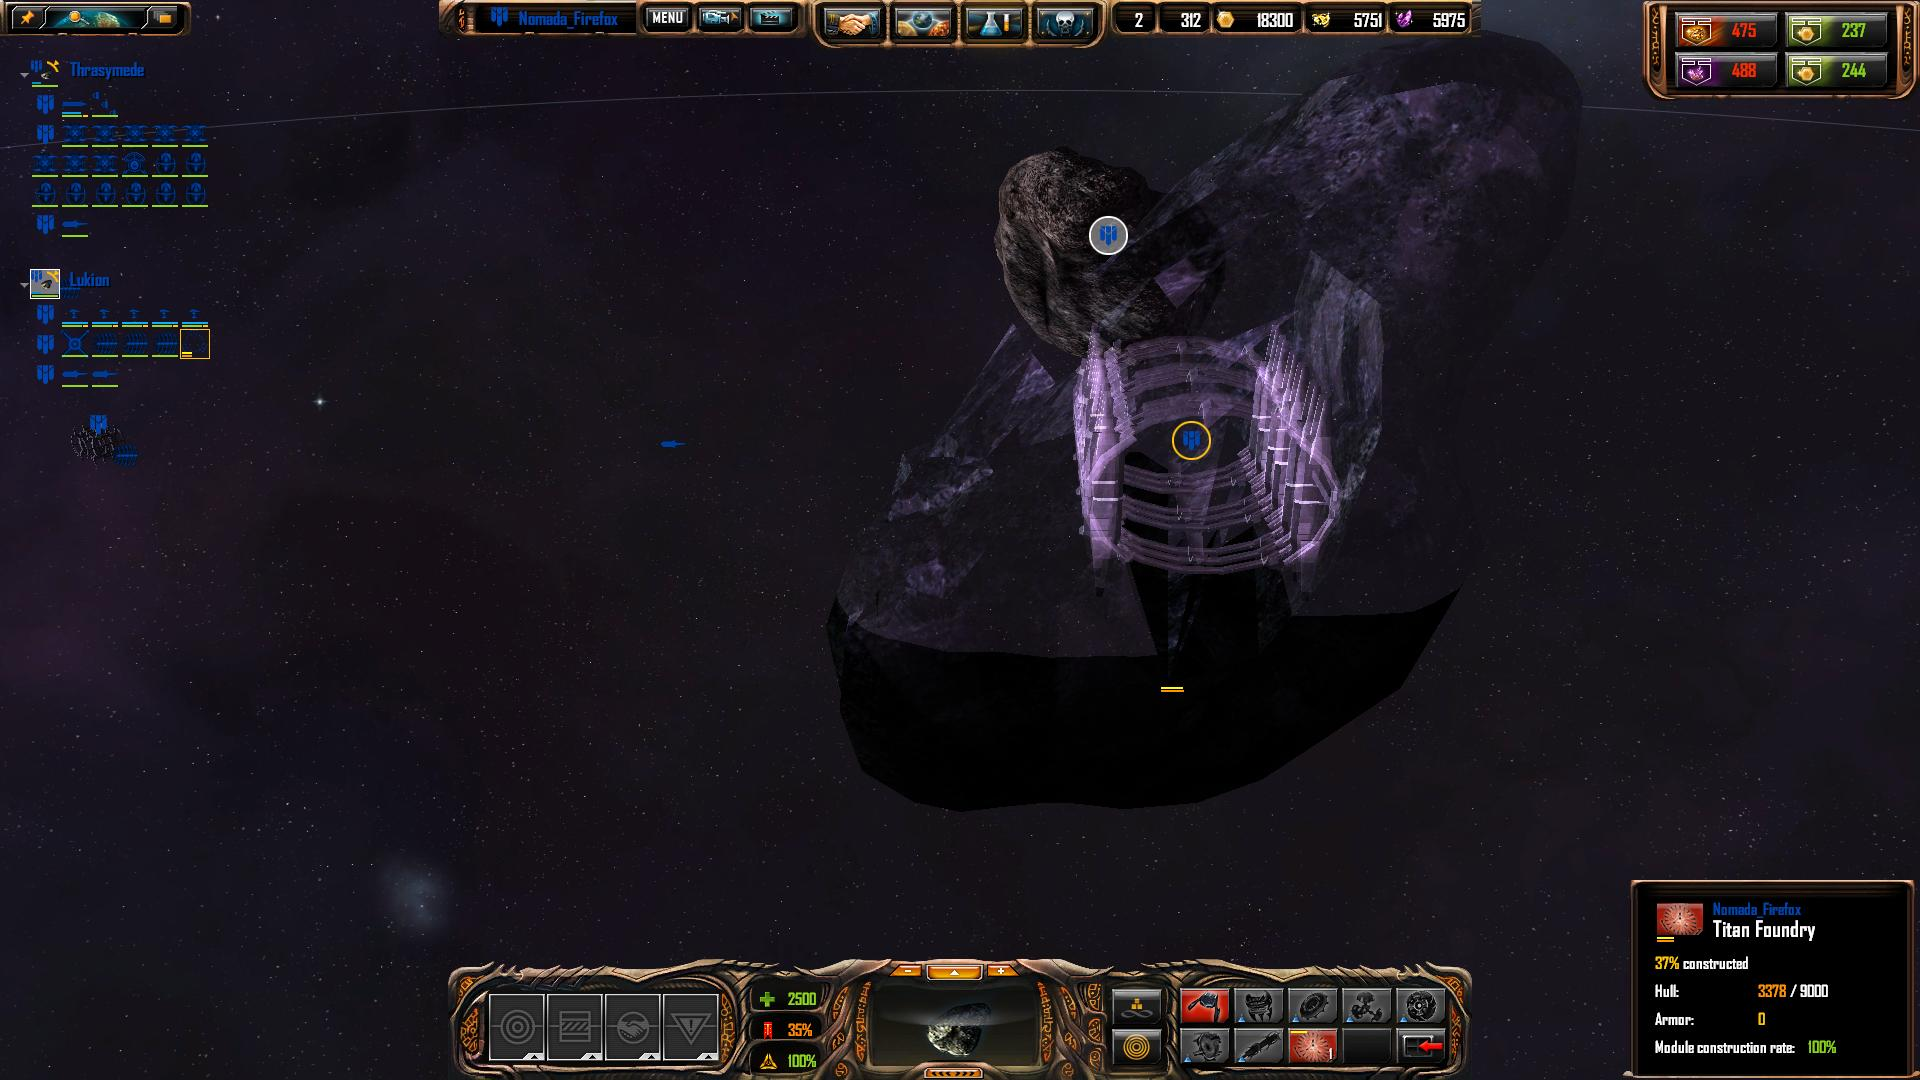 Titan shipyard image wing commander alliance mod for for Wing commander